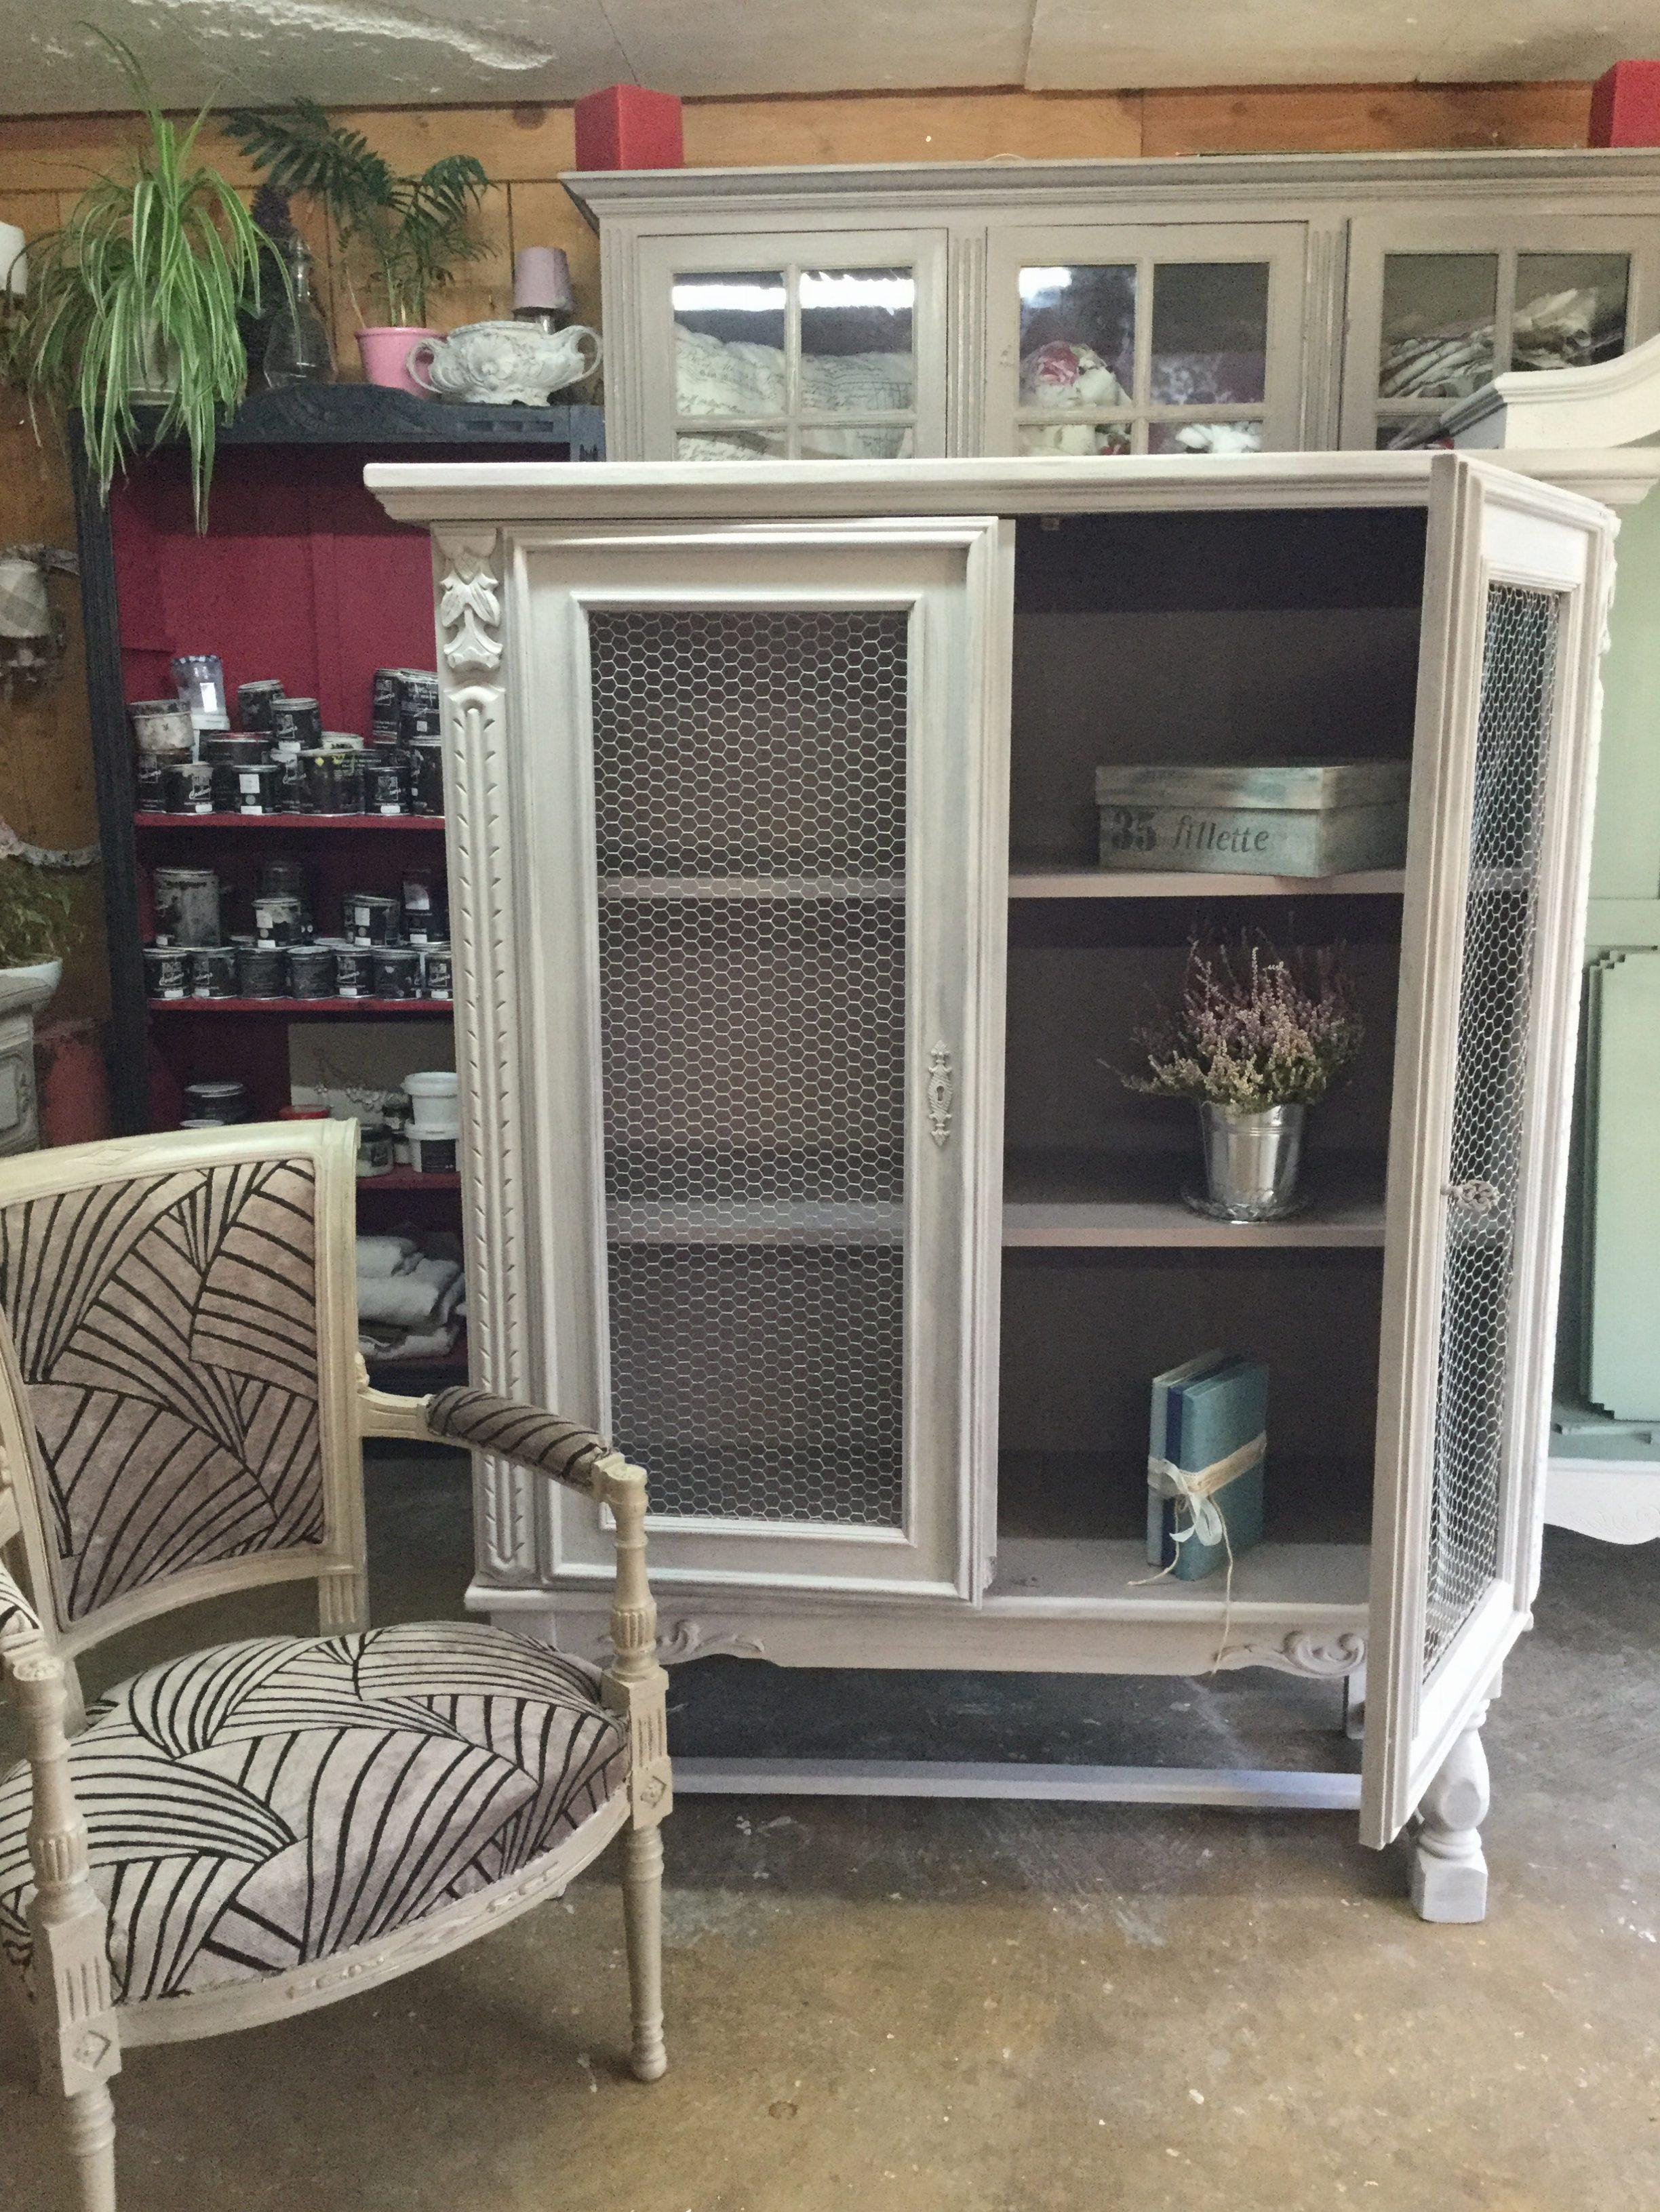 meuble avec grillage poule xy25 montrealeast. Black Bedroom Furniture Sets. Home Design Ideas